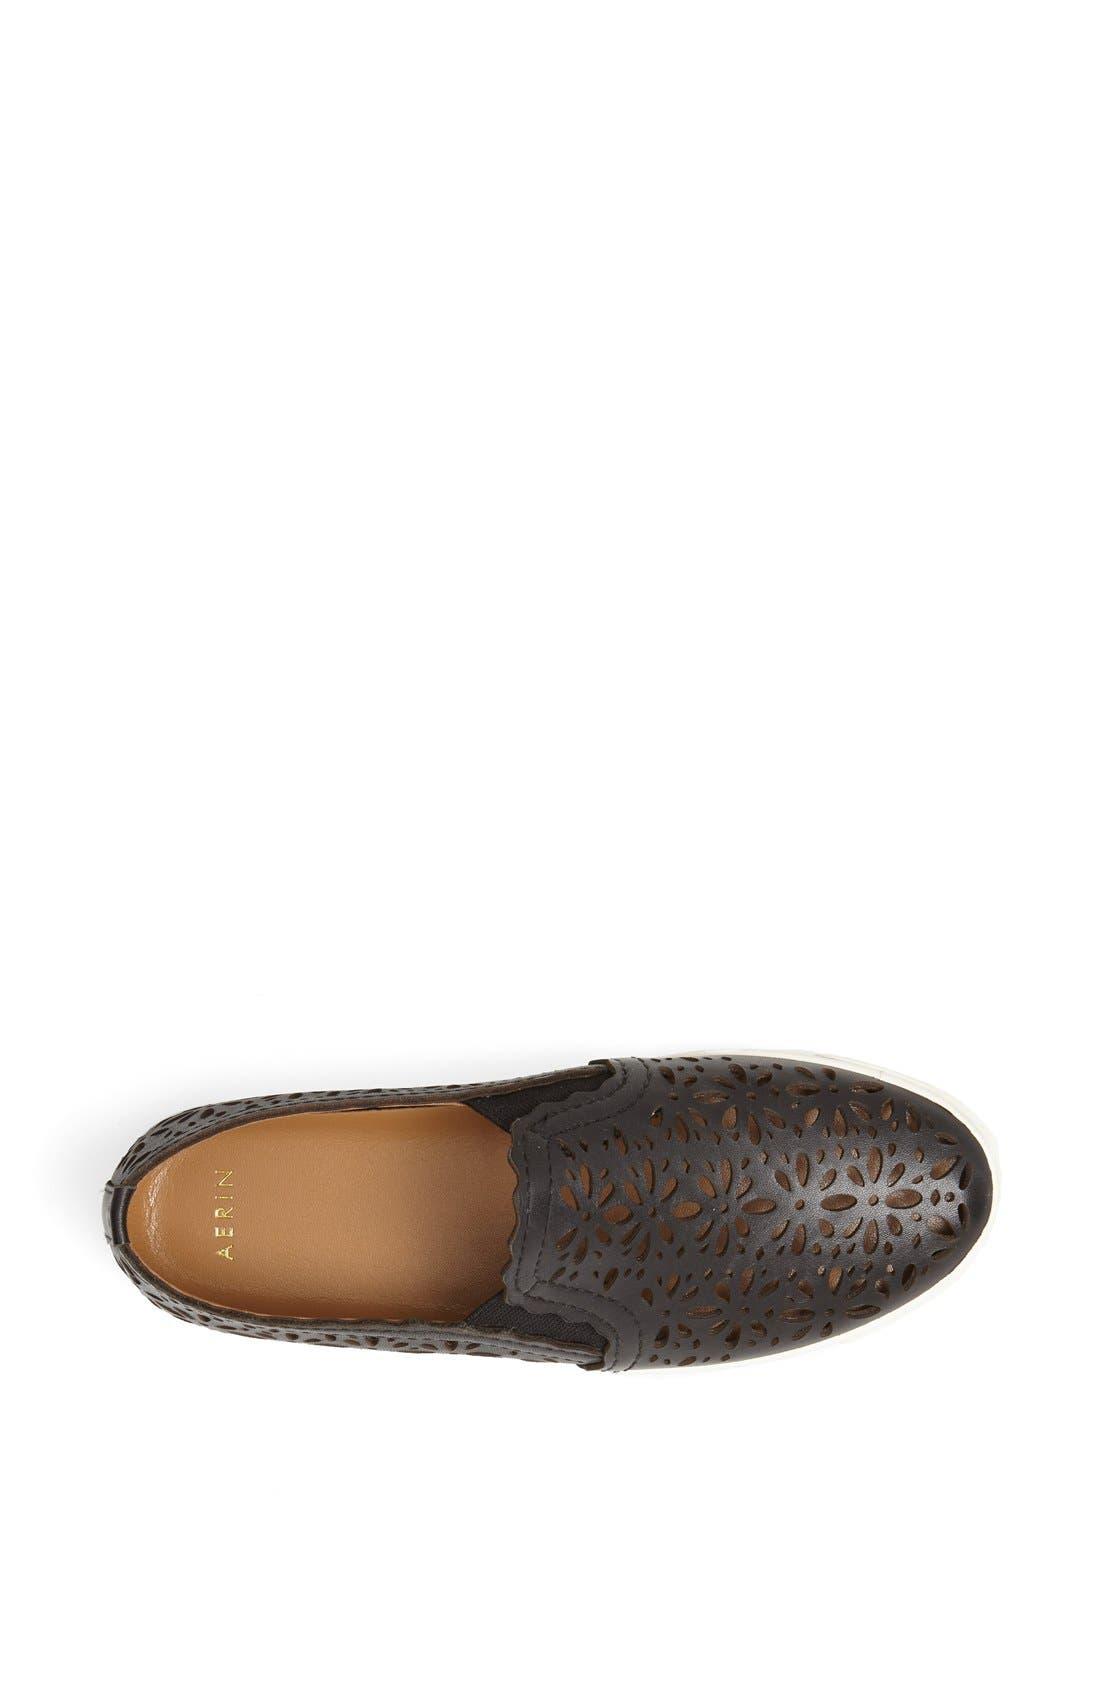 AERIN,                             'Murex' Perforated Slip-On Sneaker,                             Alternate thumbnail 2, color,                             001